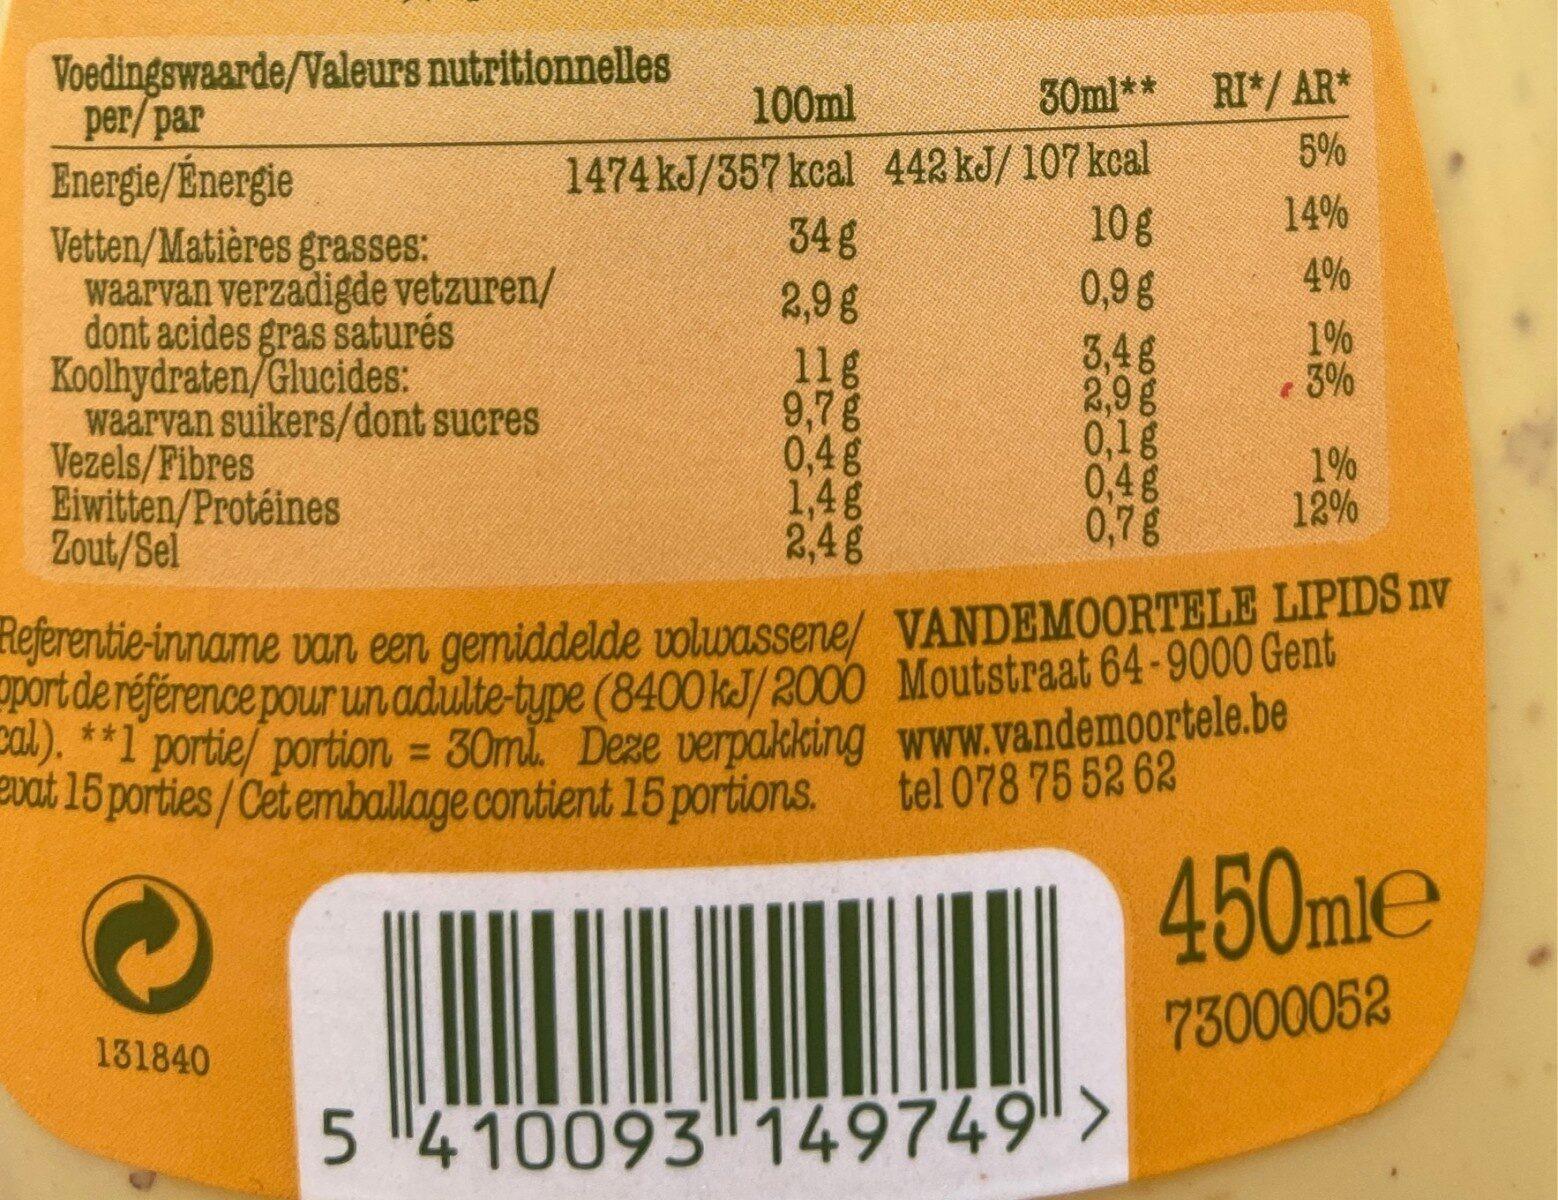 Vinaigrette miel moutarde - Voedingswaarden - fr